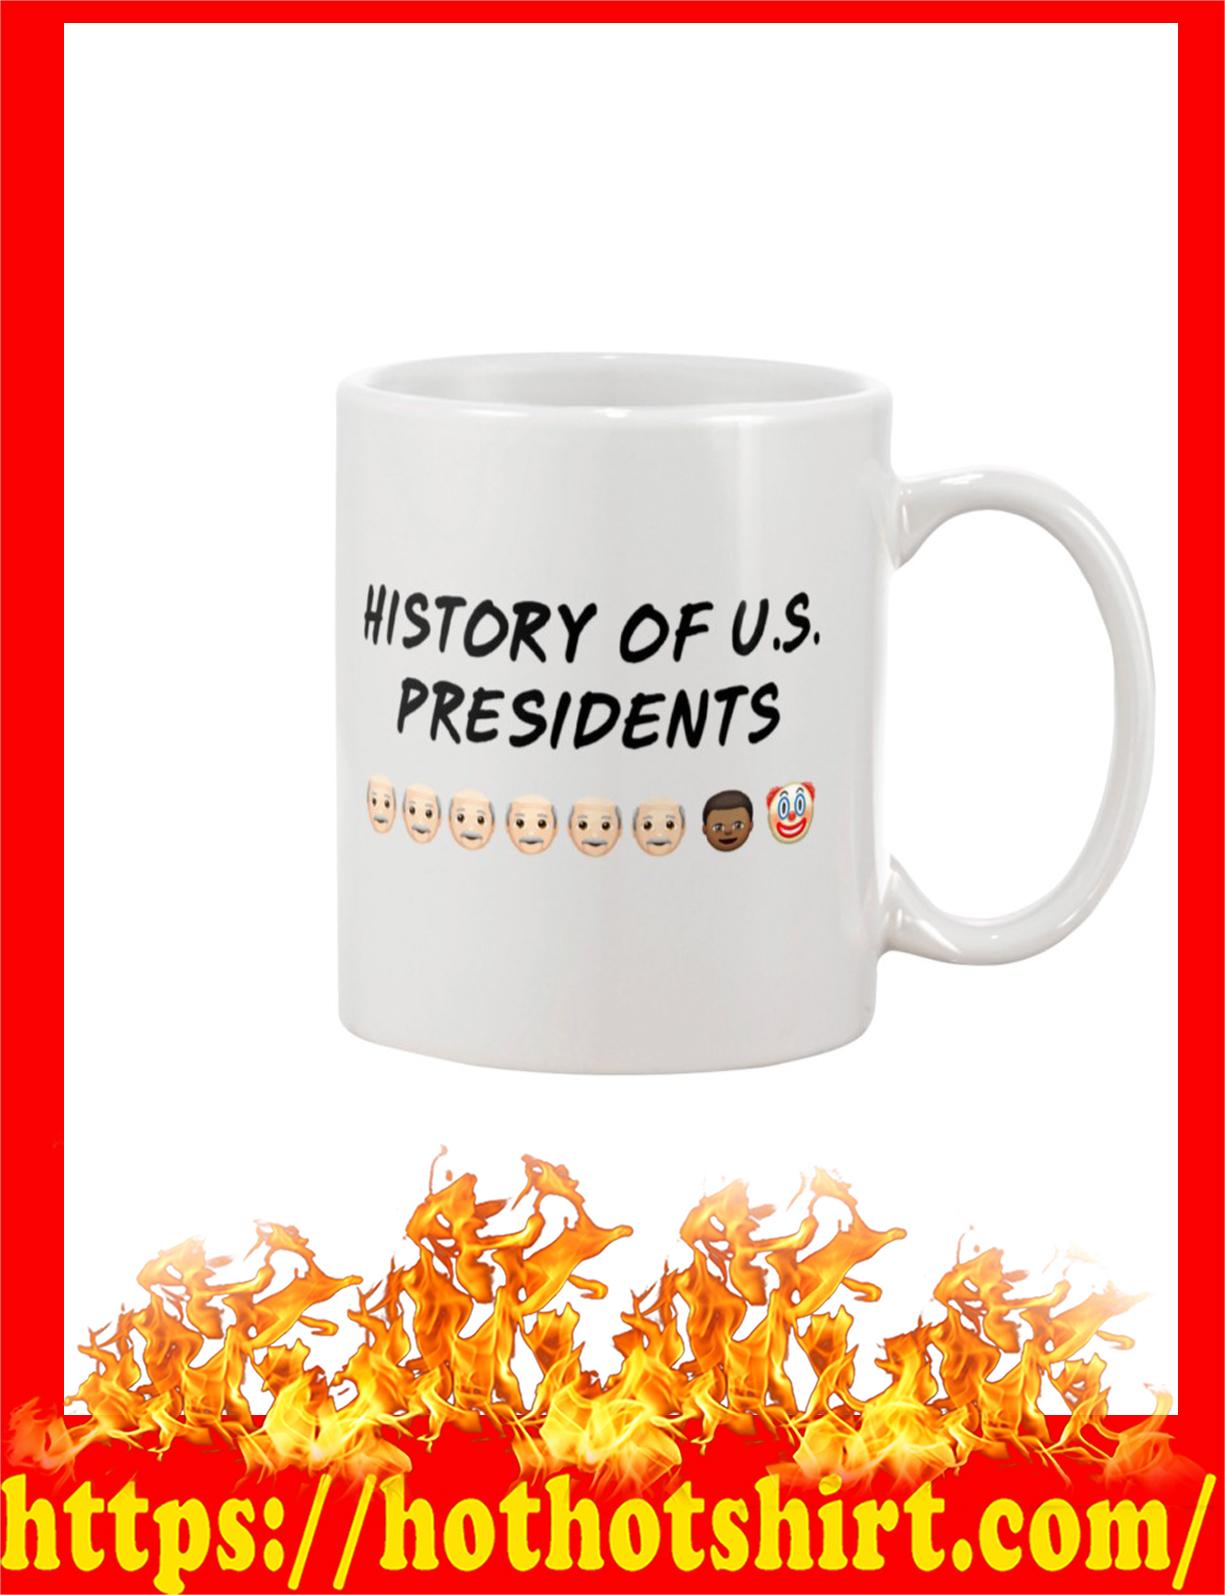 History of us presidents mug - detail